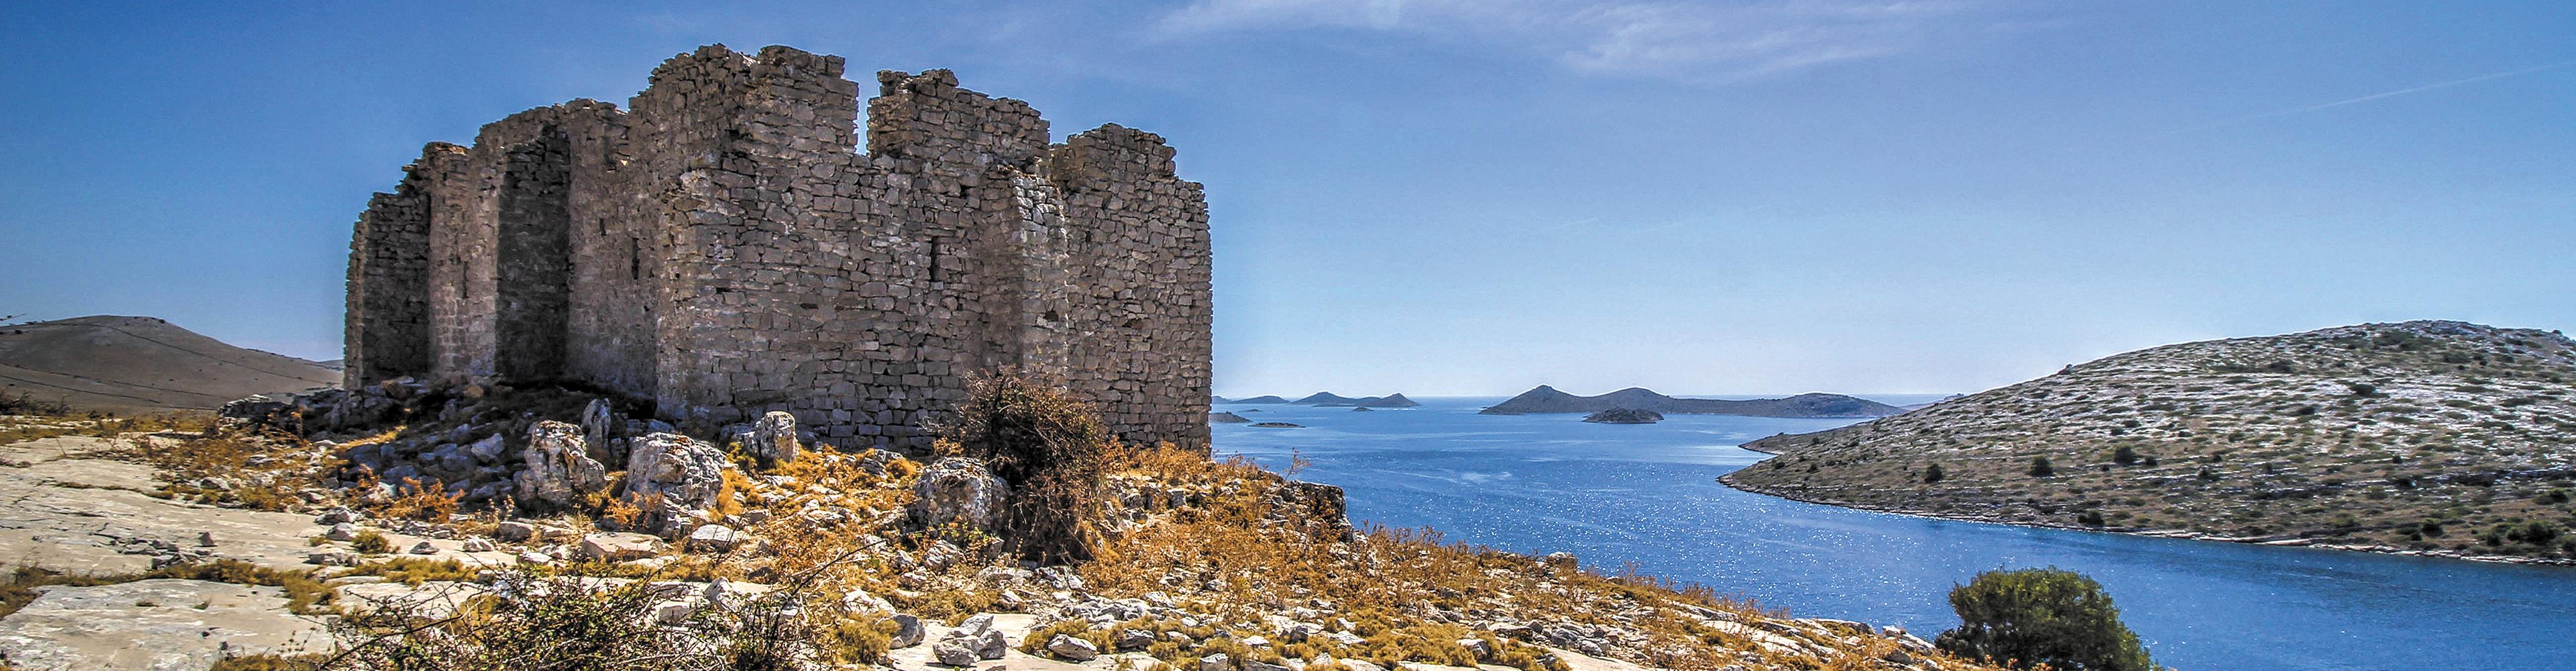 Cruising Croatia's Central Coast (Peregrine Dalmatia)